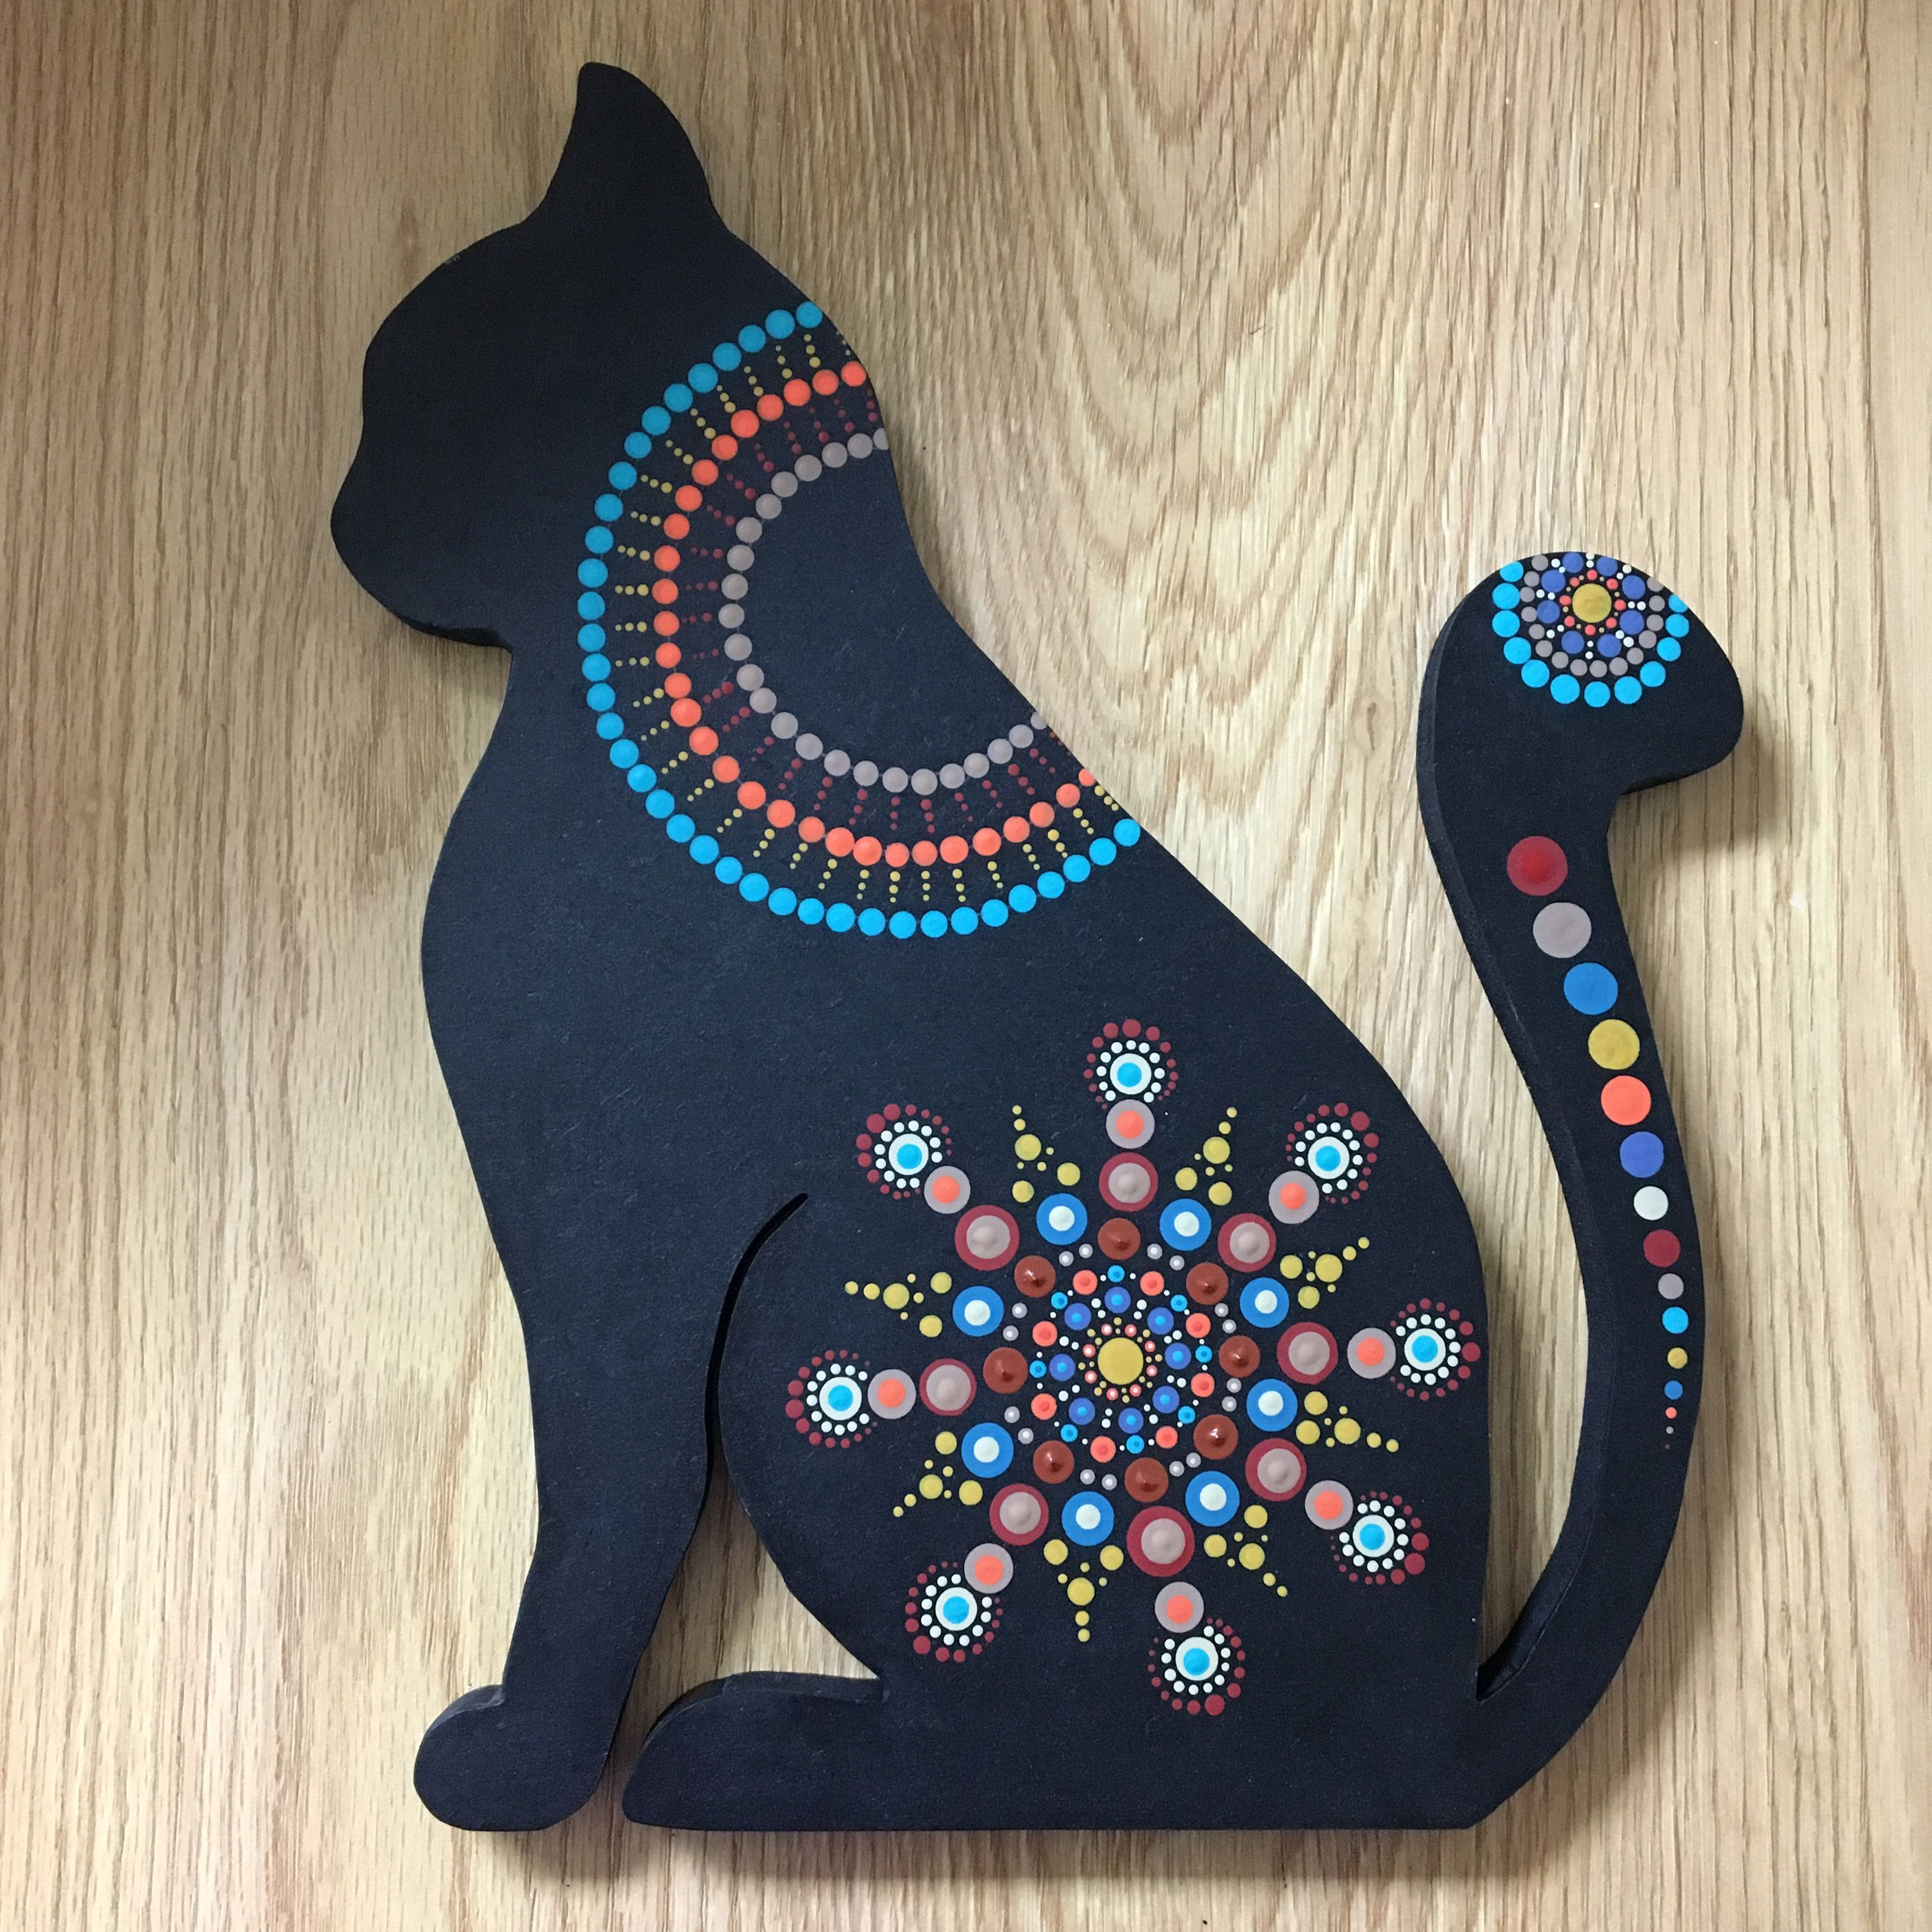 Wood Cat Mandala Rock Painting Pinterest Mandala And Rock  # Muebles Sirena Animal Crossing